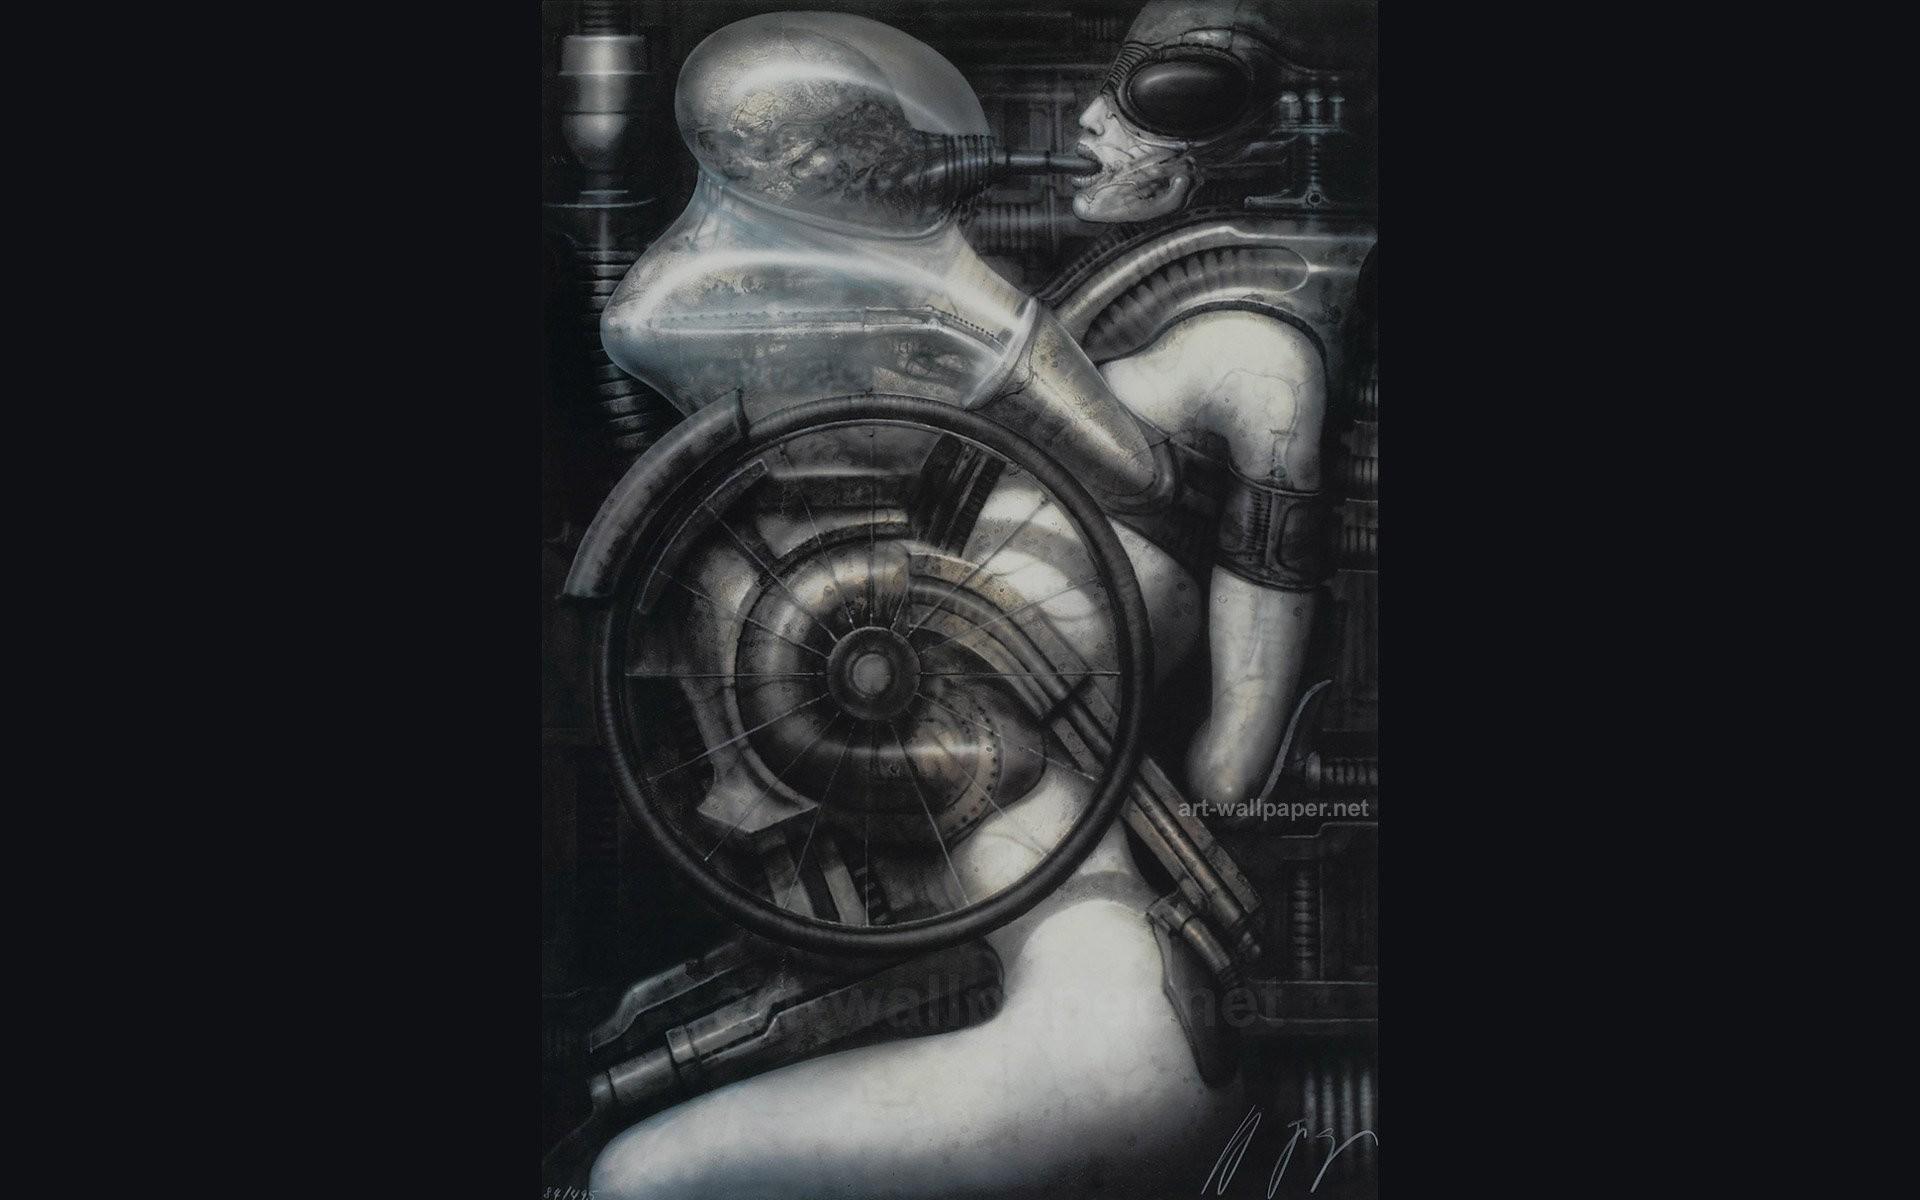 H R Giger Art Artwork Dark Evil Artistic Horror Fantasy - Hr Giger Sex Art - HD Wallpaper